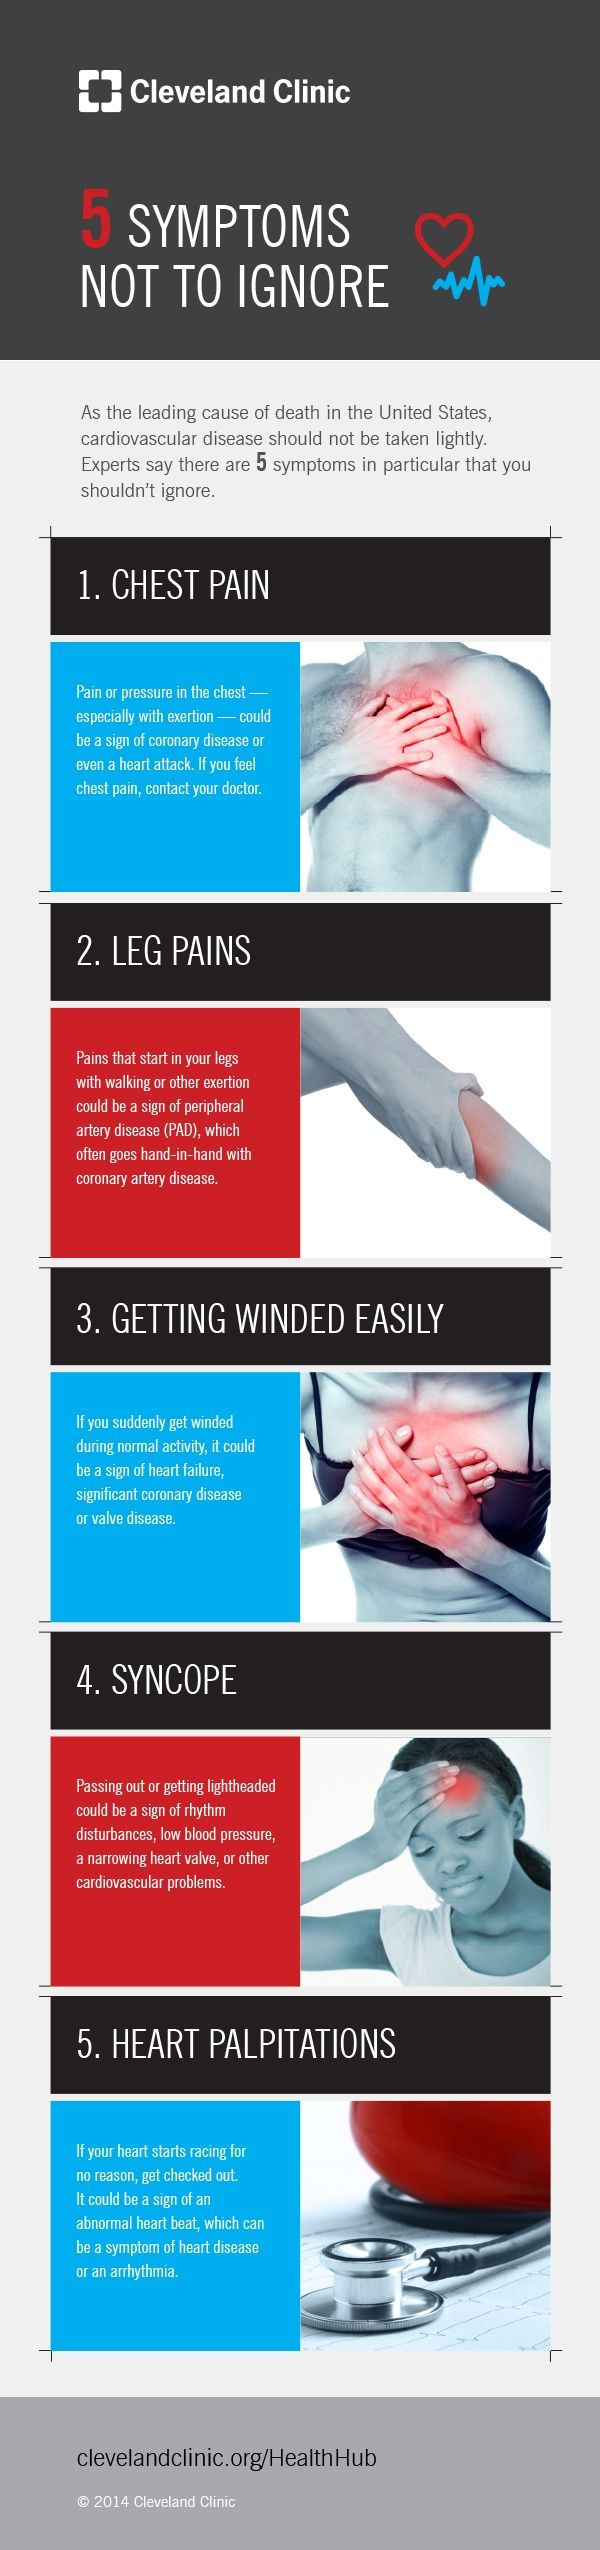 5 #heart symptoms you shouldn't ignore